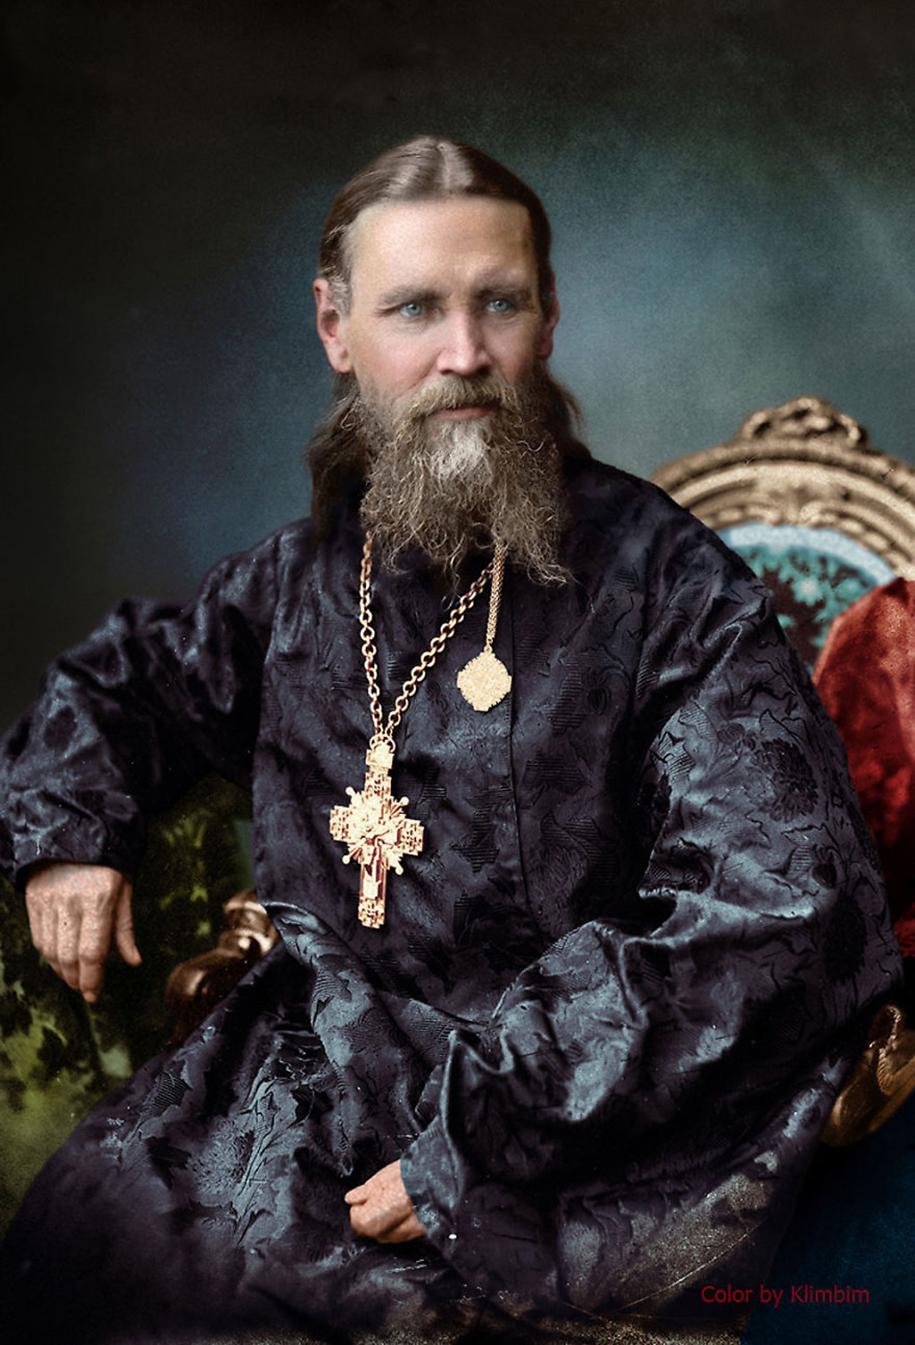 vintage-colorized-photos-soviet-russia-5